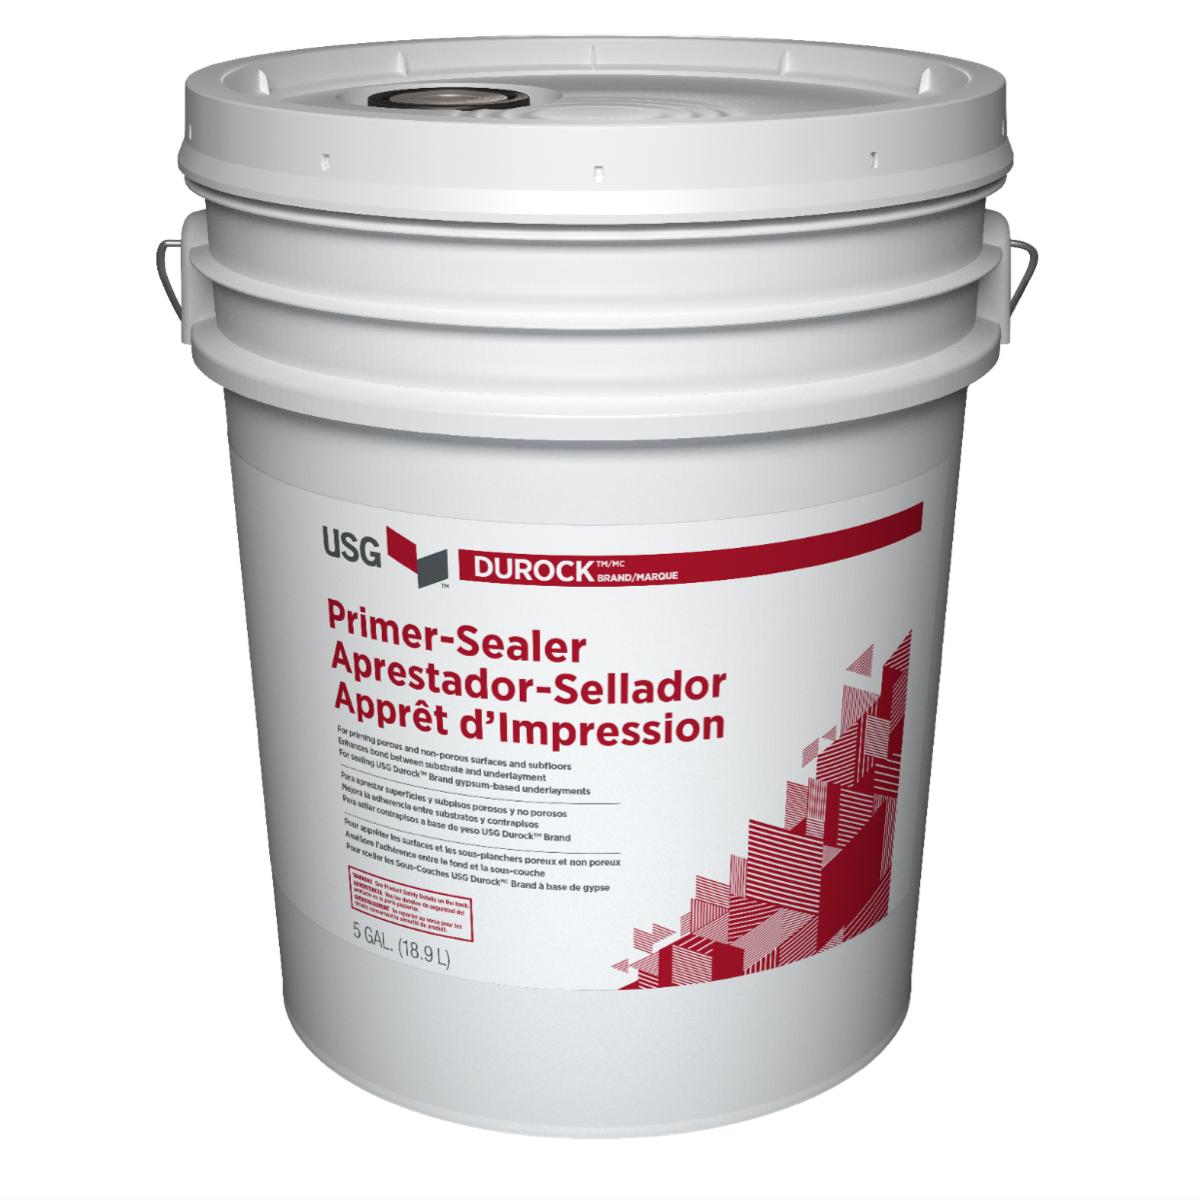 USG Primer-Sealer Durock Floor Prep